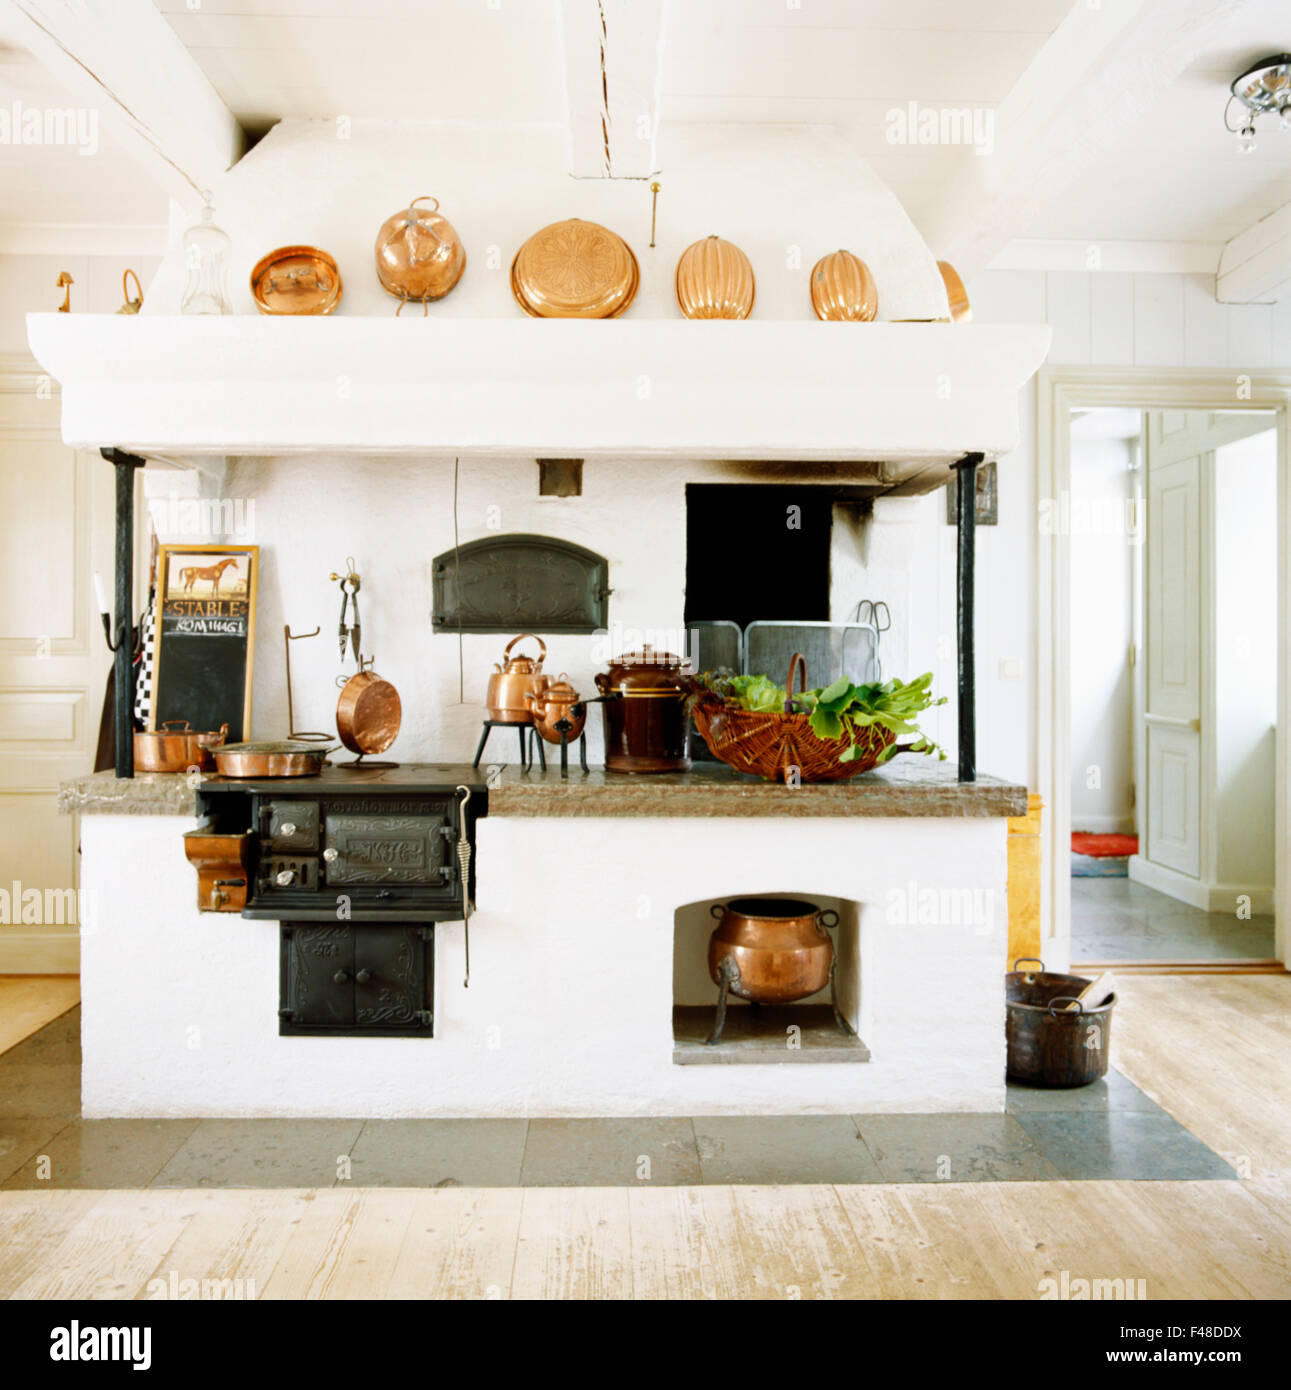 Antique Wood Stove Kitchen Stock Photos & Antique Wood Stove Kitchen ...